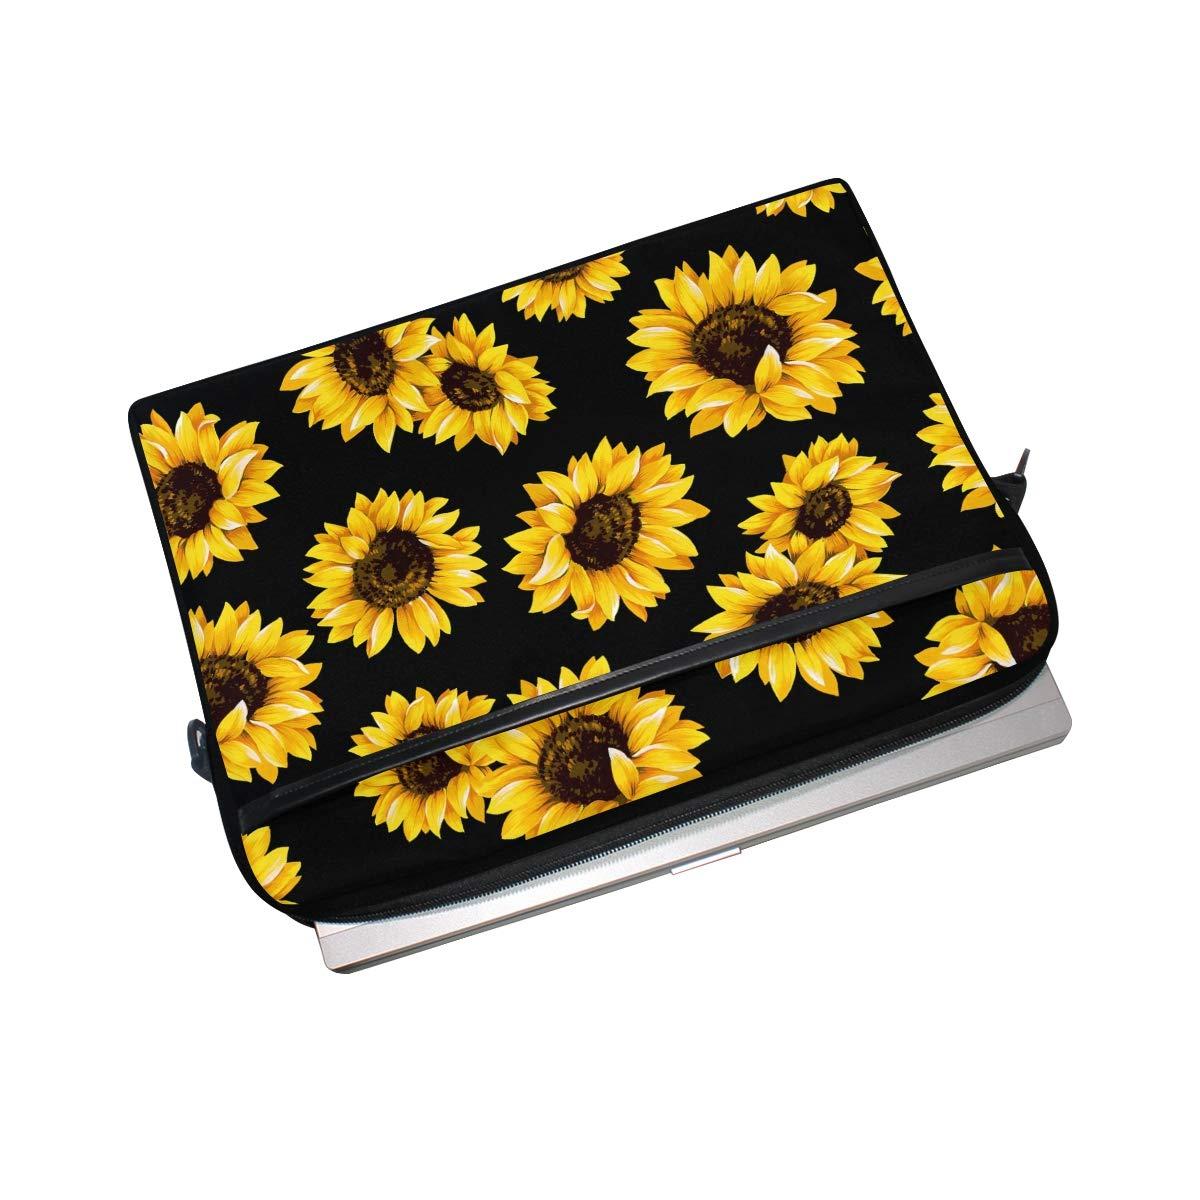 Laptop Bag Sunflower Shoulder Messenger Laptop Case Sleeve Yellow Sunflowers Vintage Briefcase 13//14//15.6 Inch for Men Women